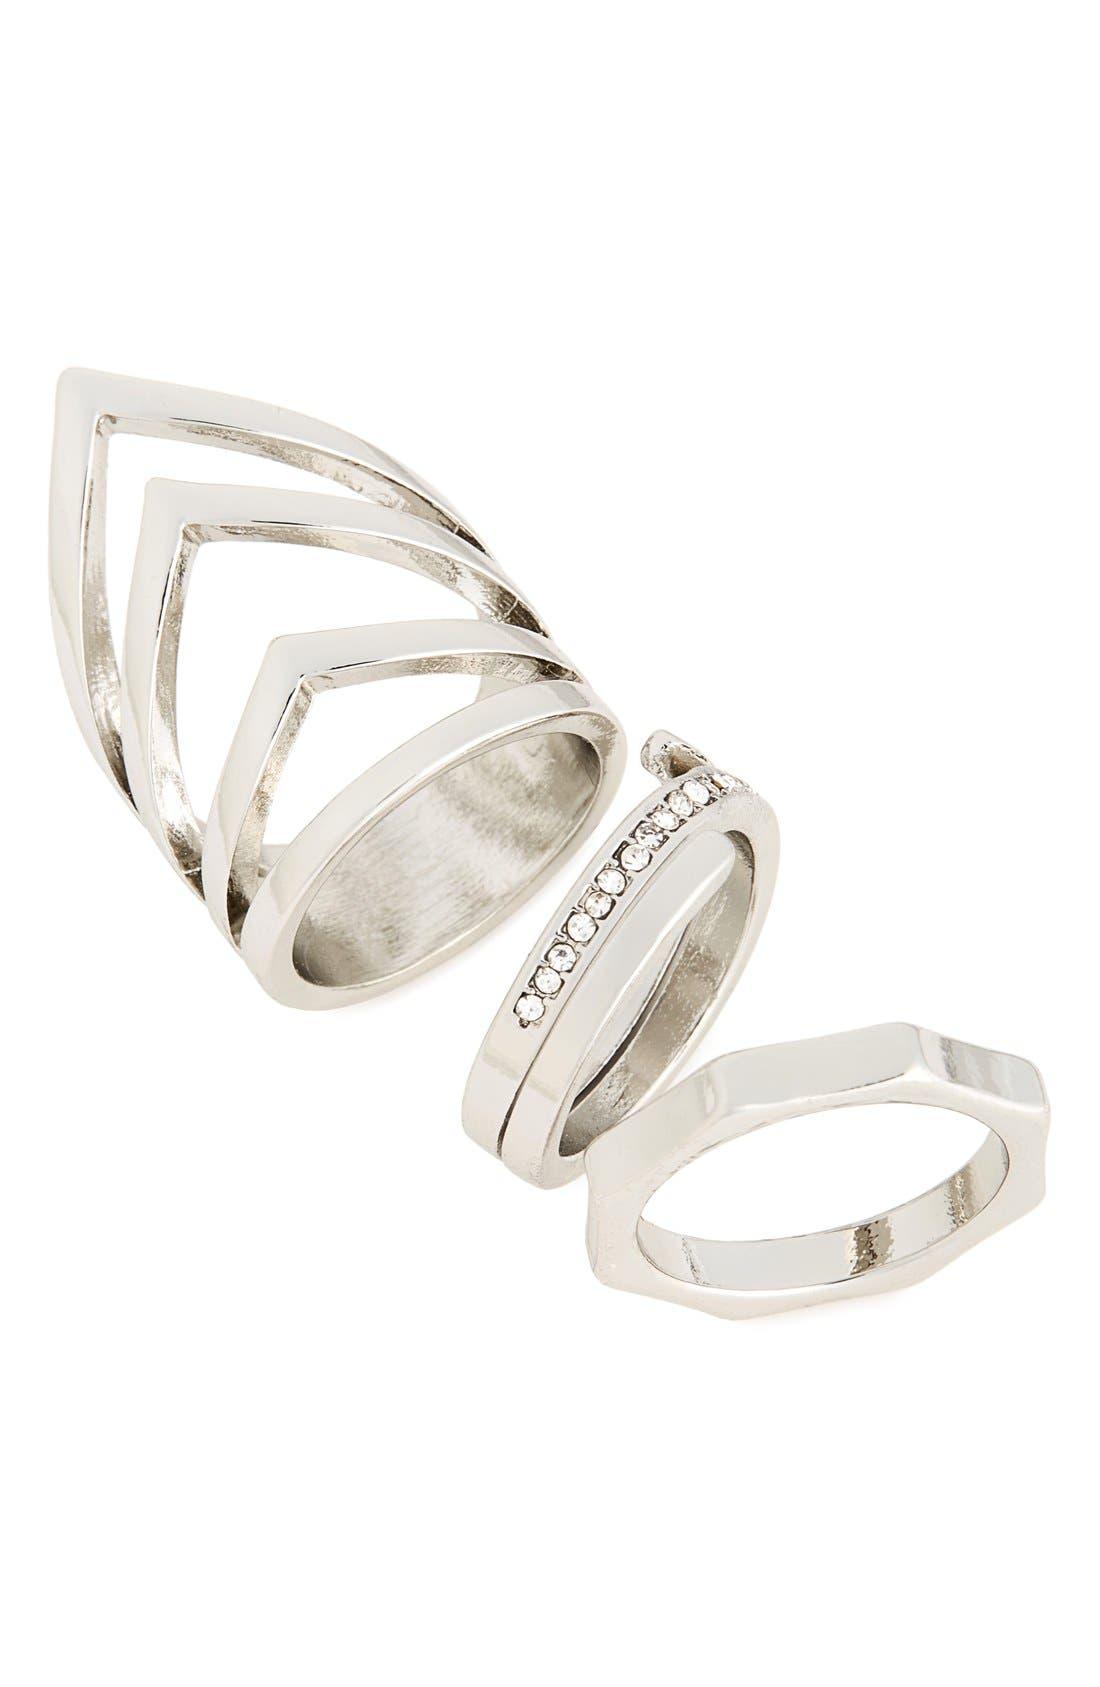 Alternate Image 1 Selected - Topshop Set of 3 Rings